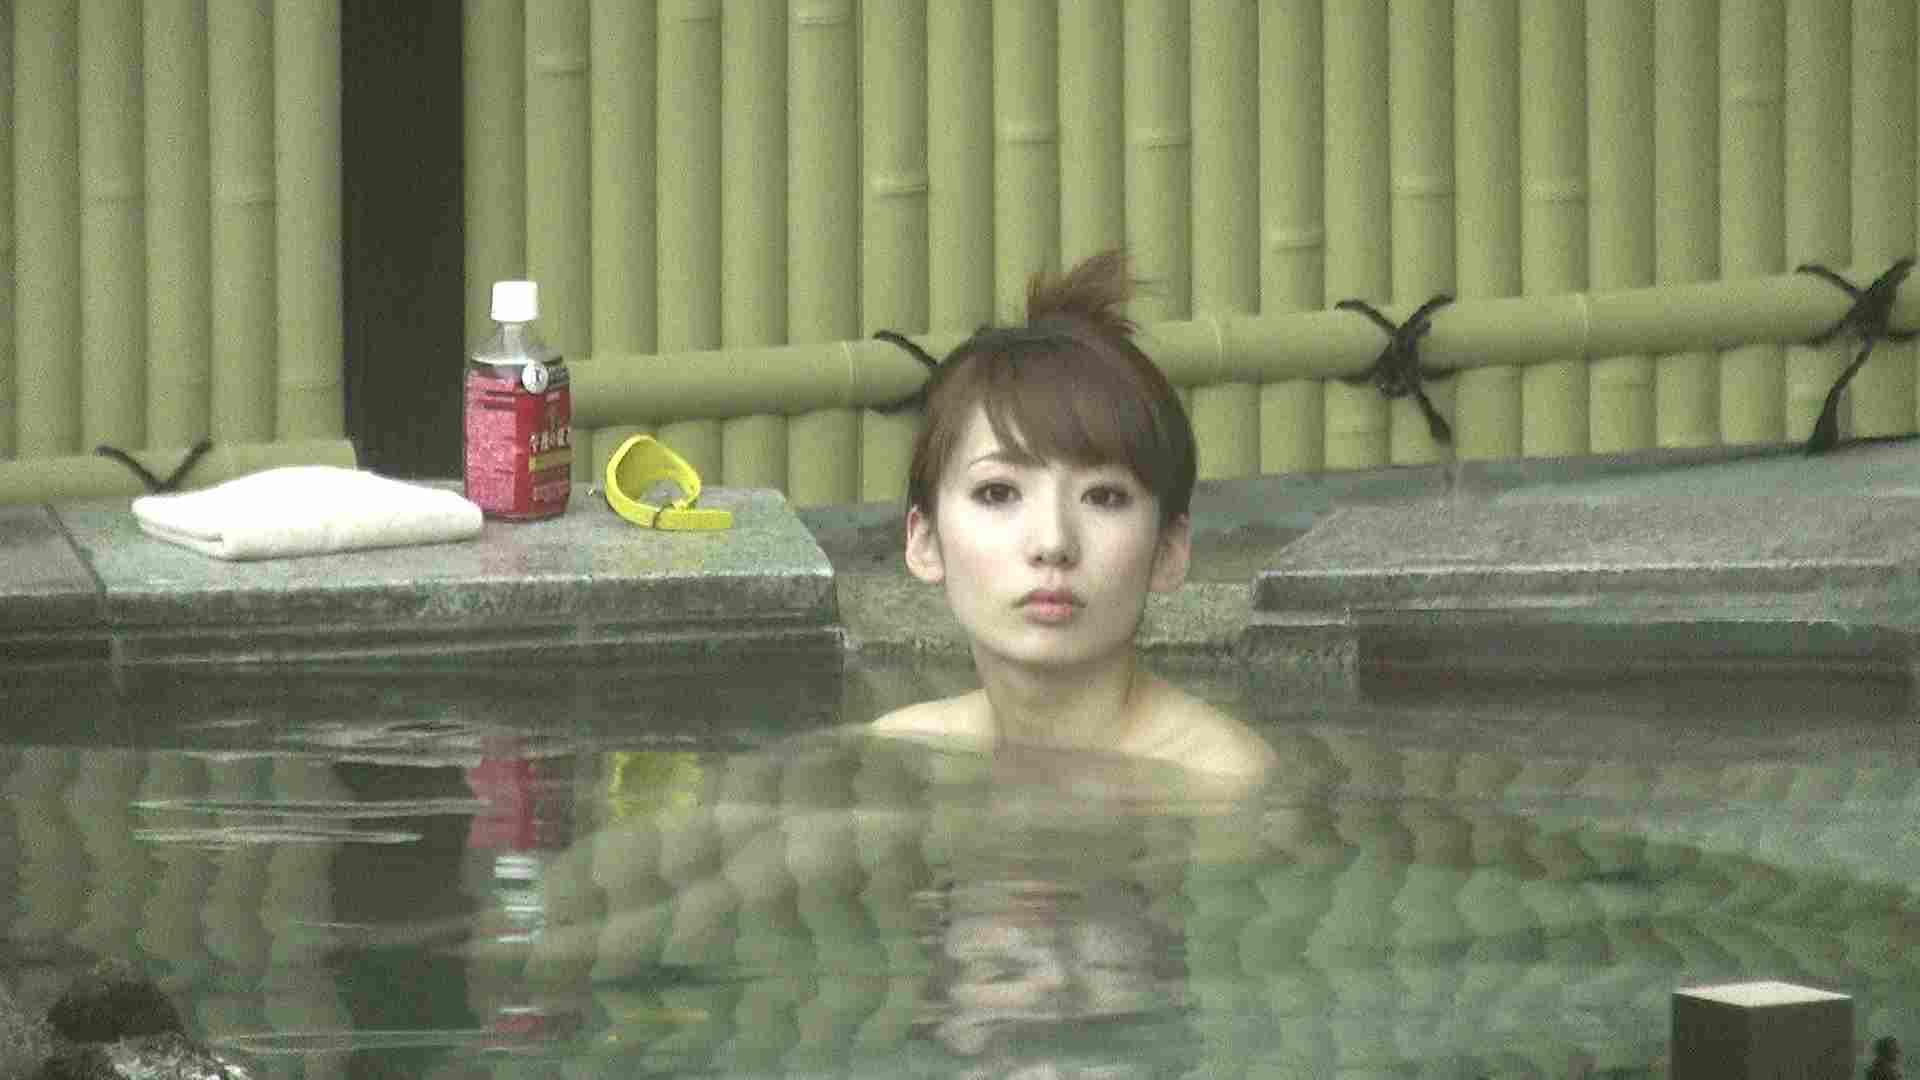 Aquaな露天風呂Vol.208 盗撮 隠し撮りオマンコ動画紹介 85画像 26